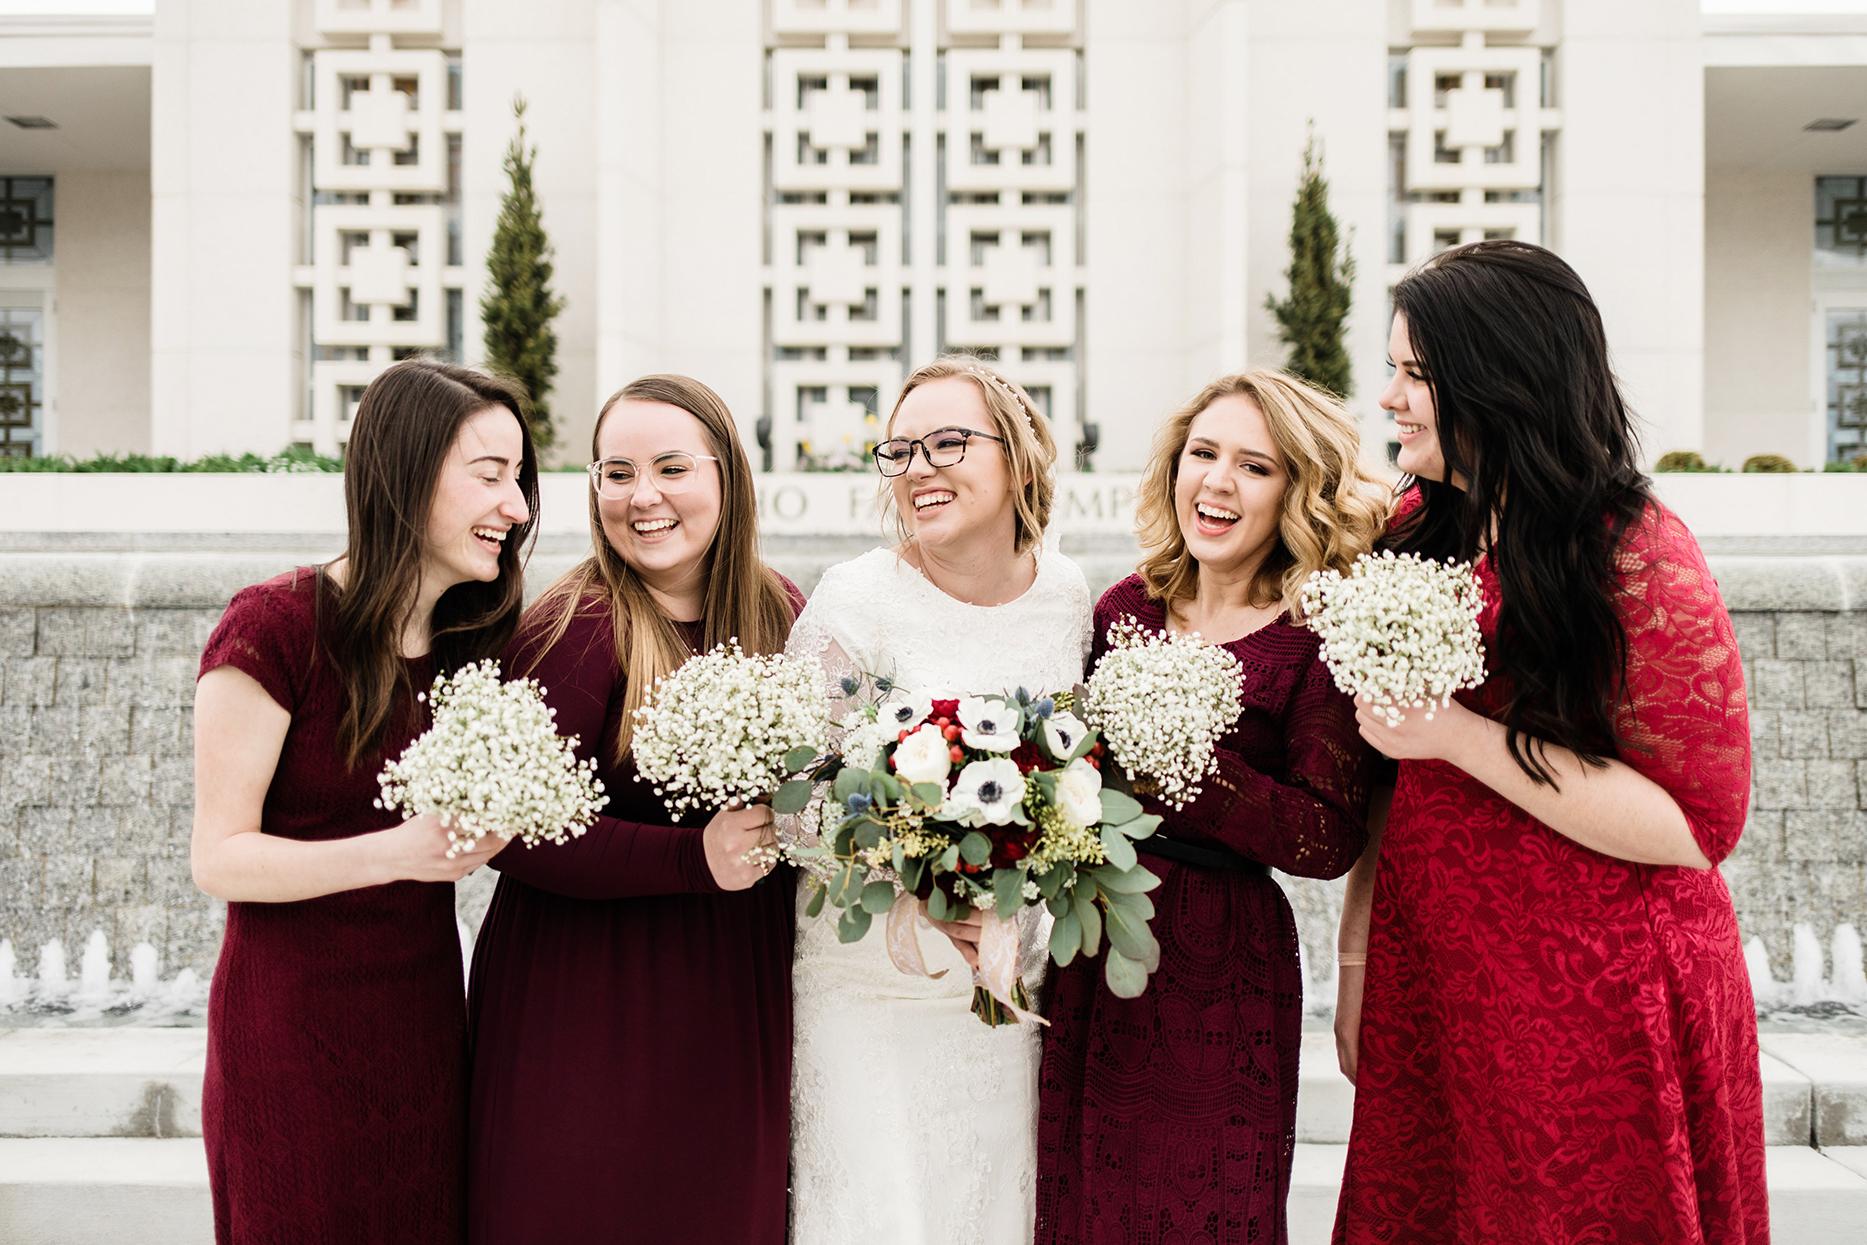 Callister Wedding April 14 2018-print-0167.jpg